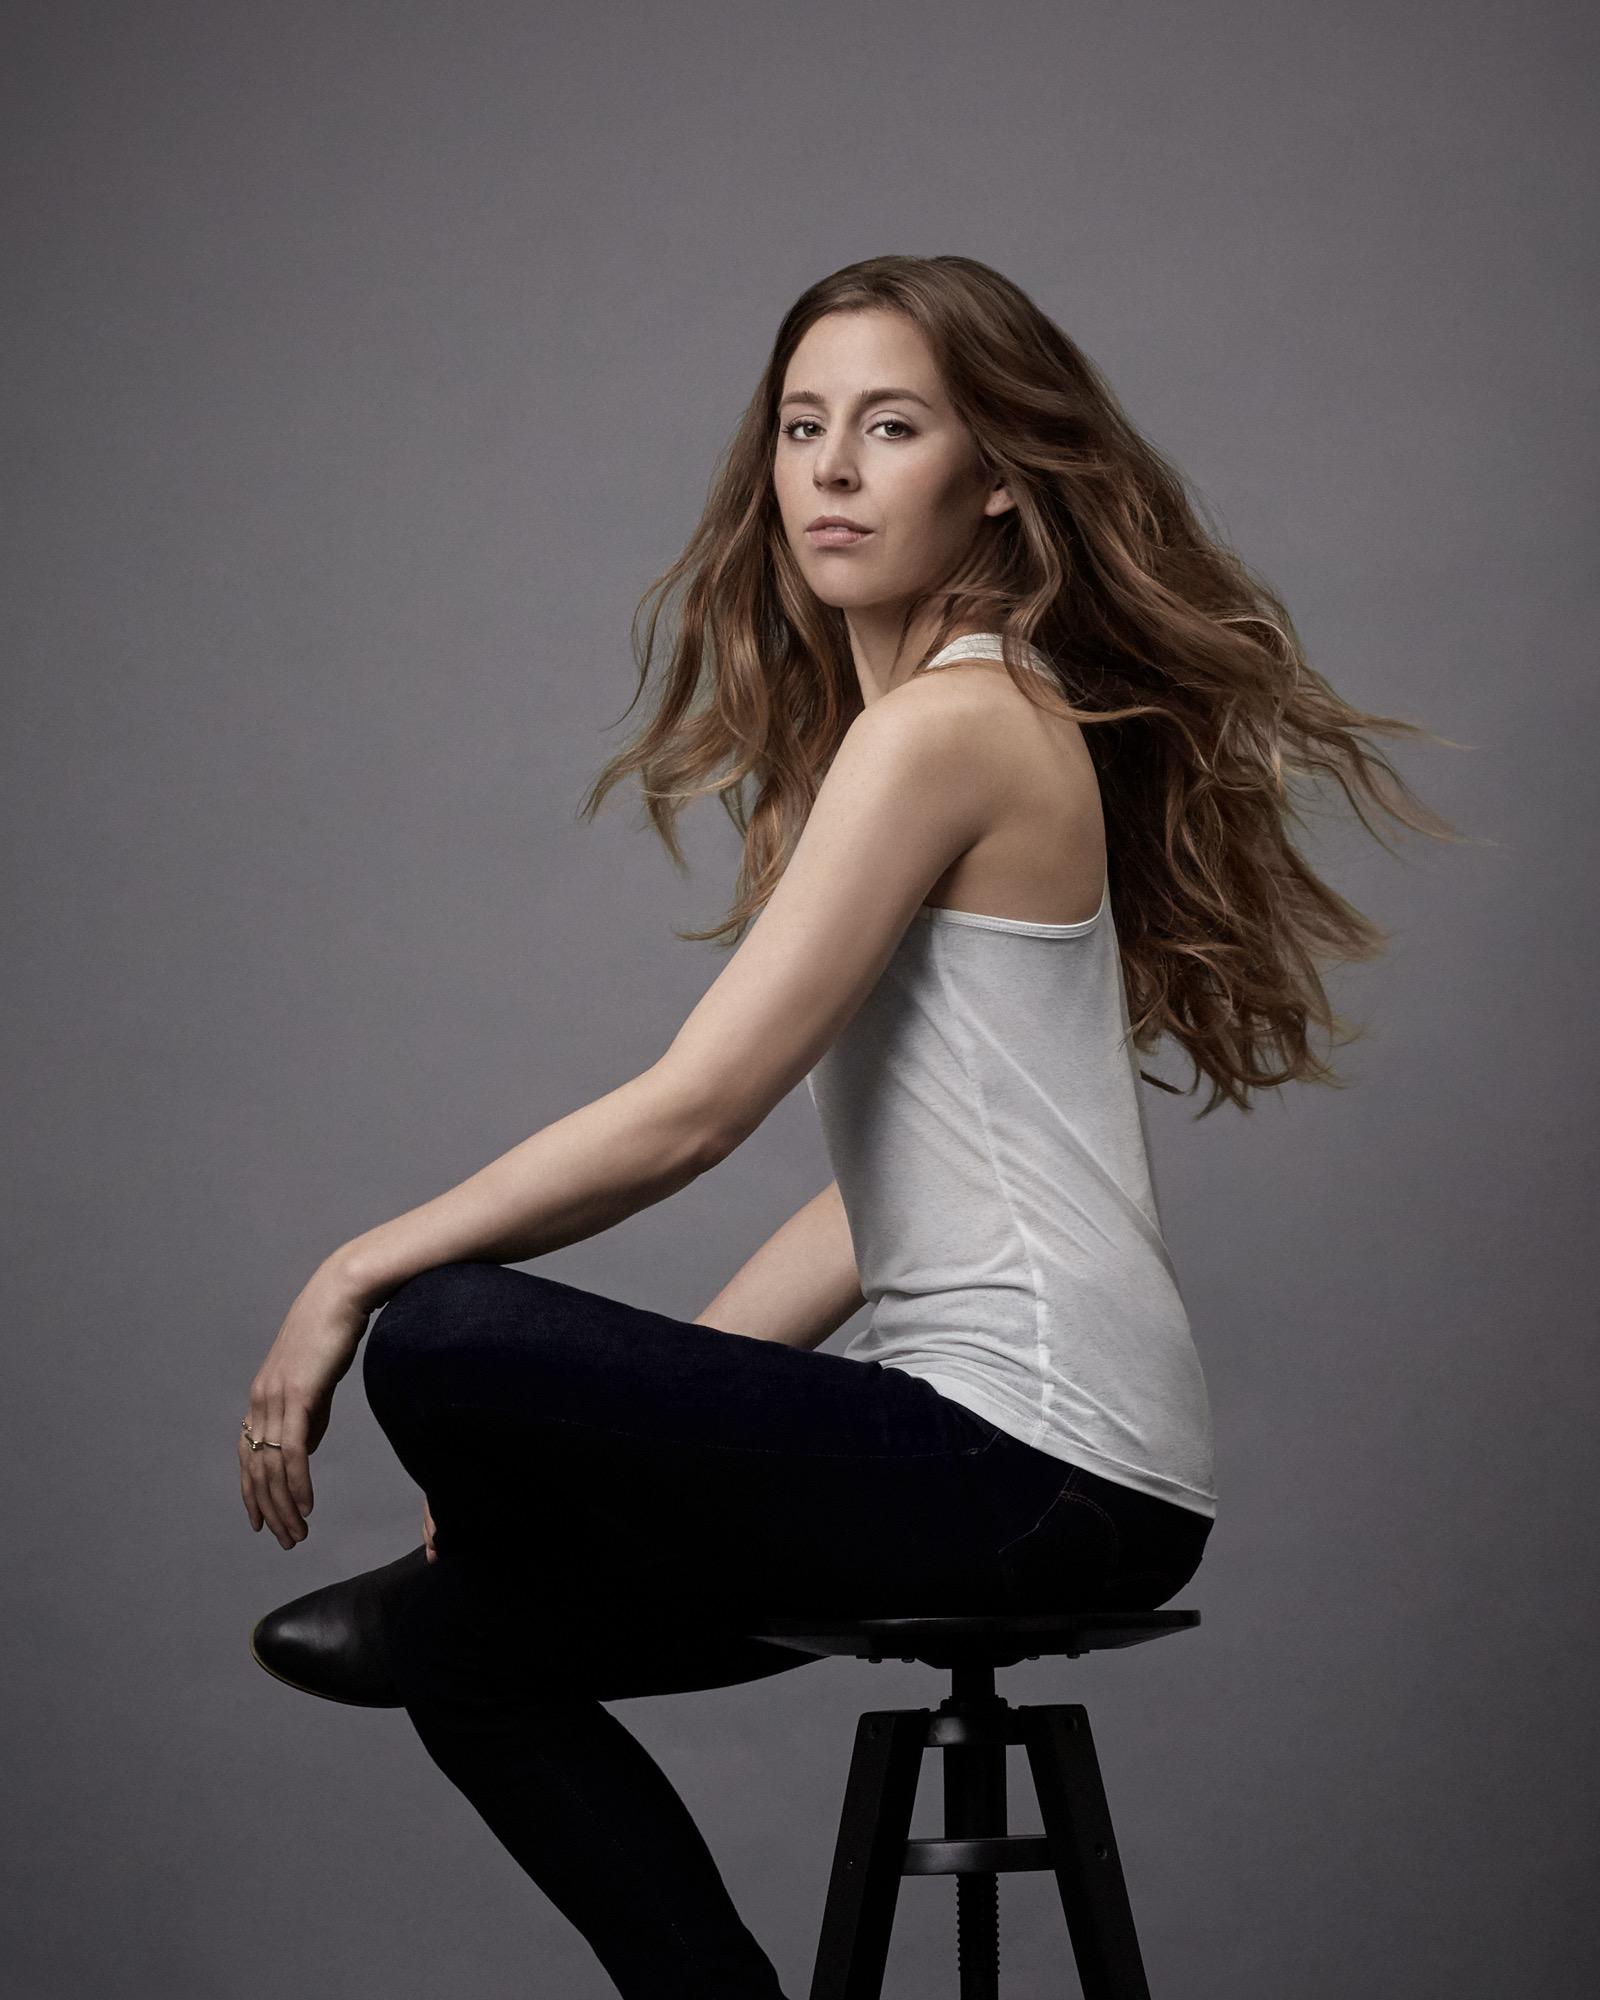 Rebecca_Beardsley_Ideal_Hairstyles